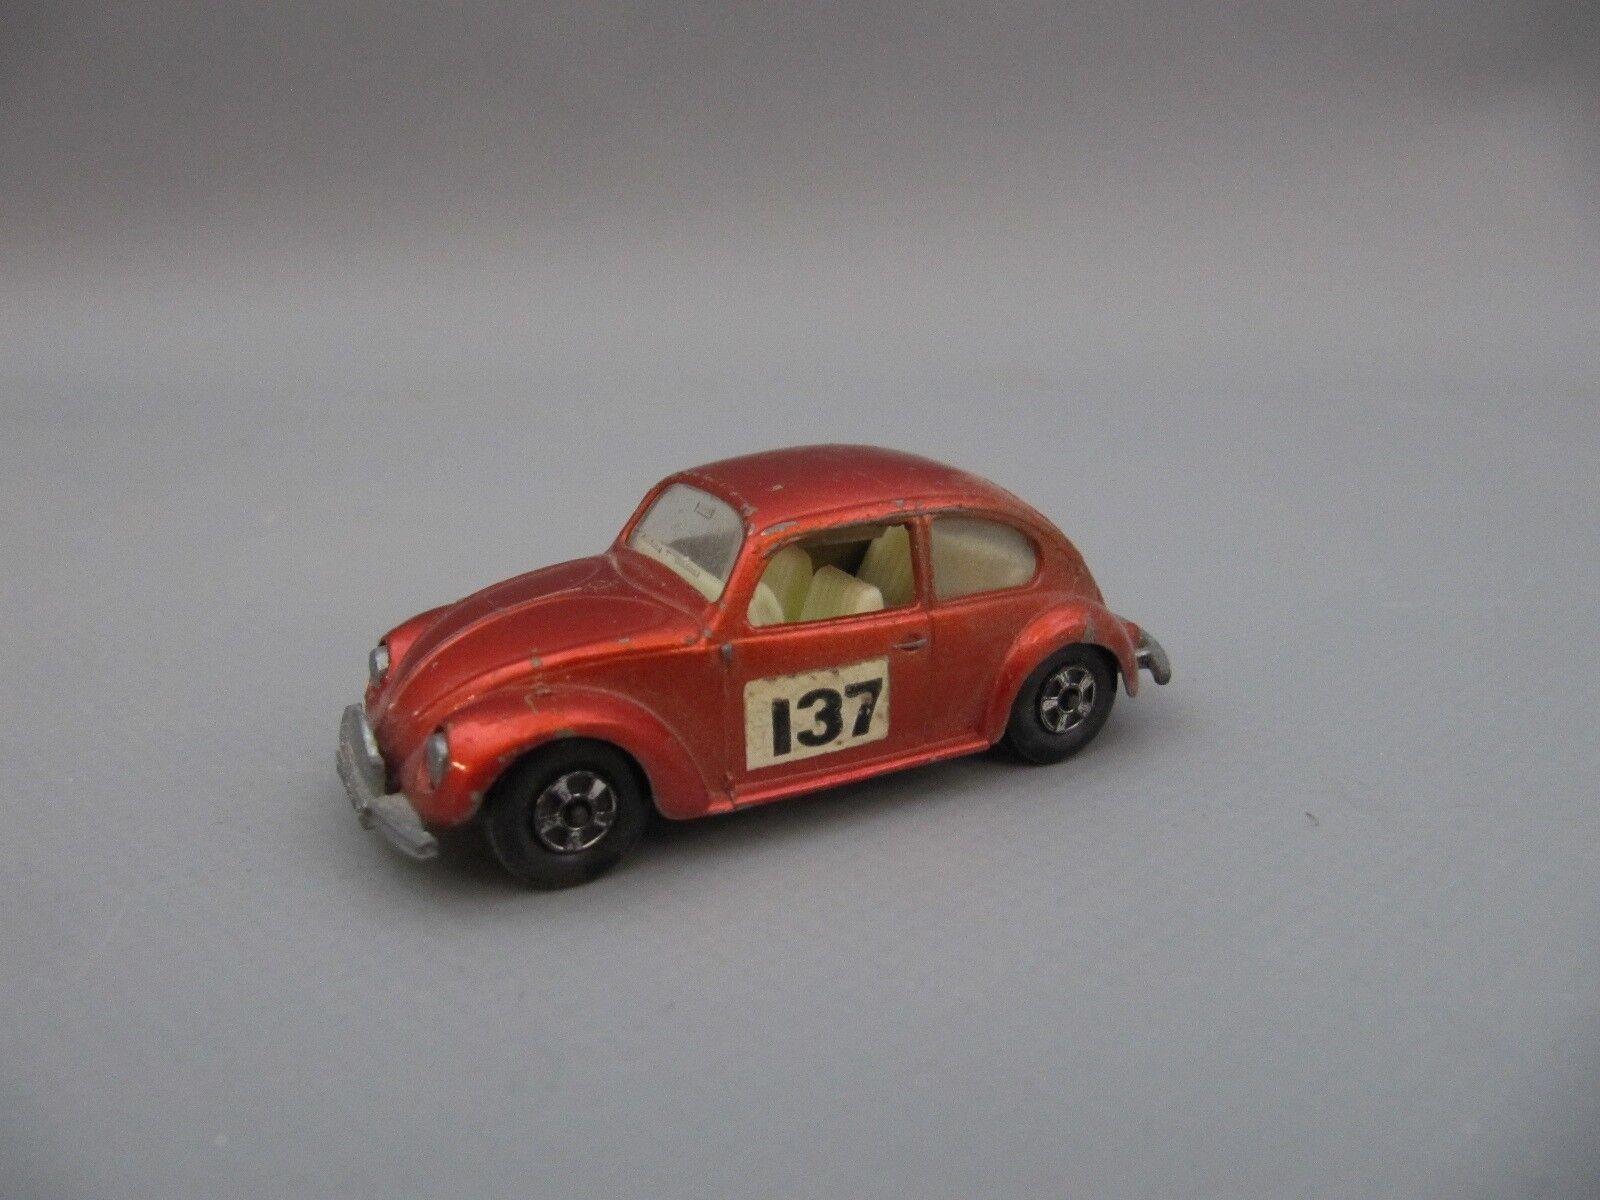 VW 1500 Saloon-Matchbox Lesney No. 15 de 1968 superfast